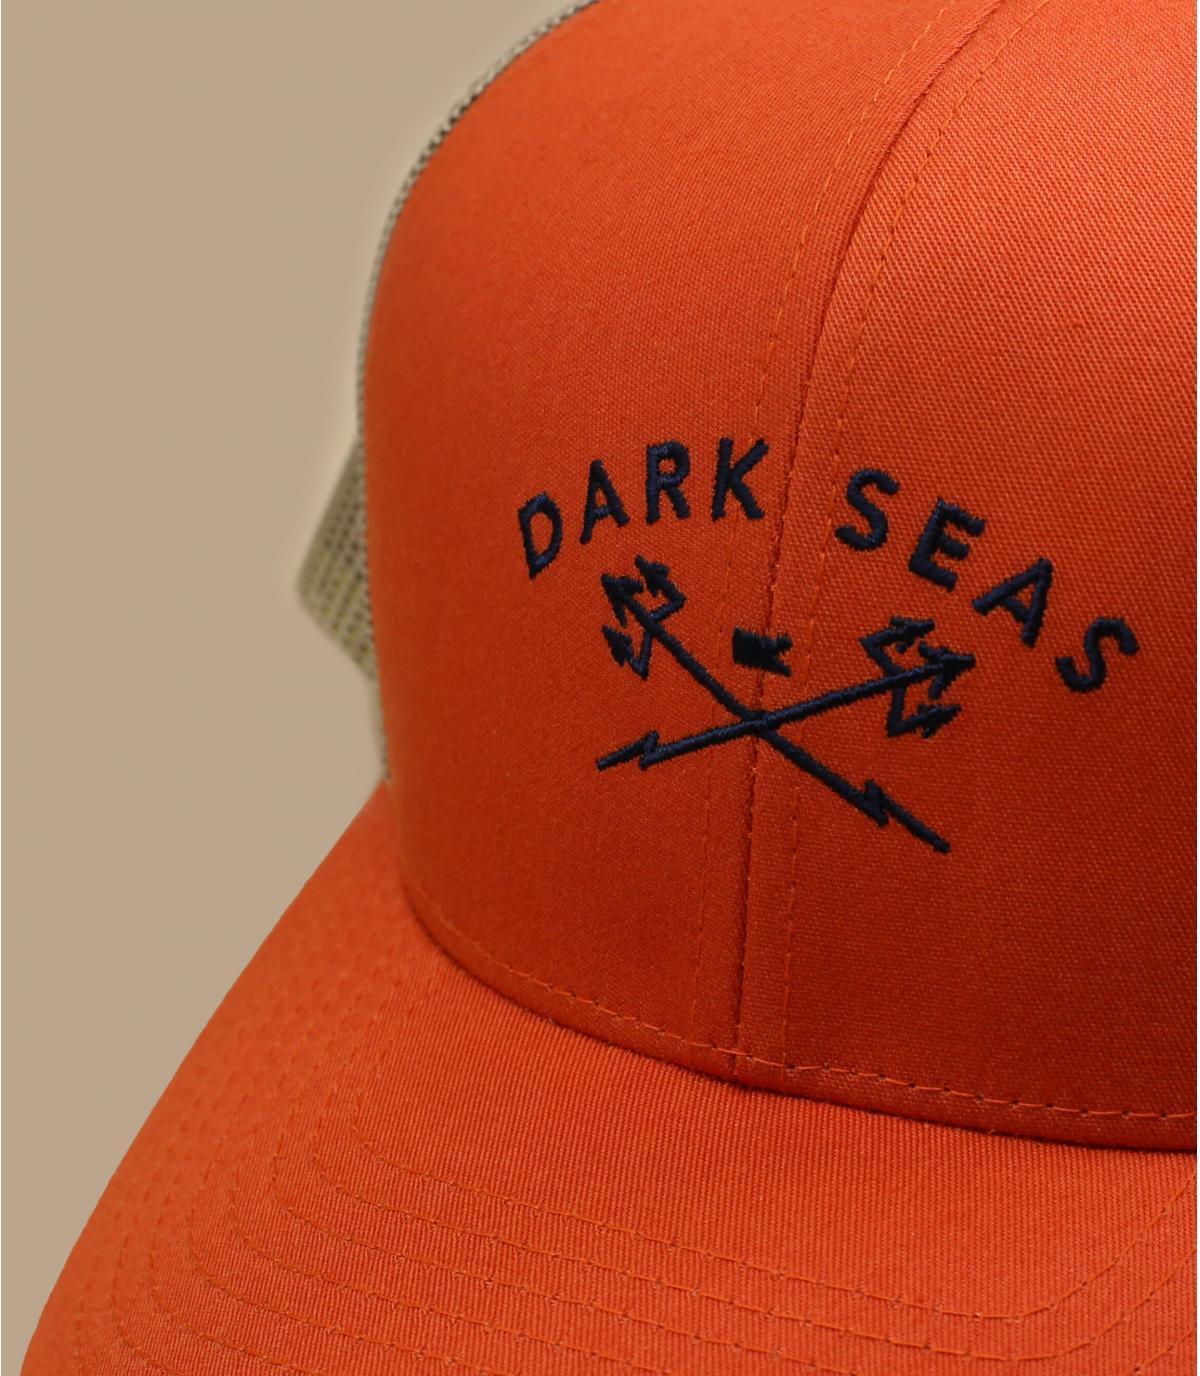 Details Murre orange khaki - Abbildung 2